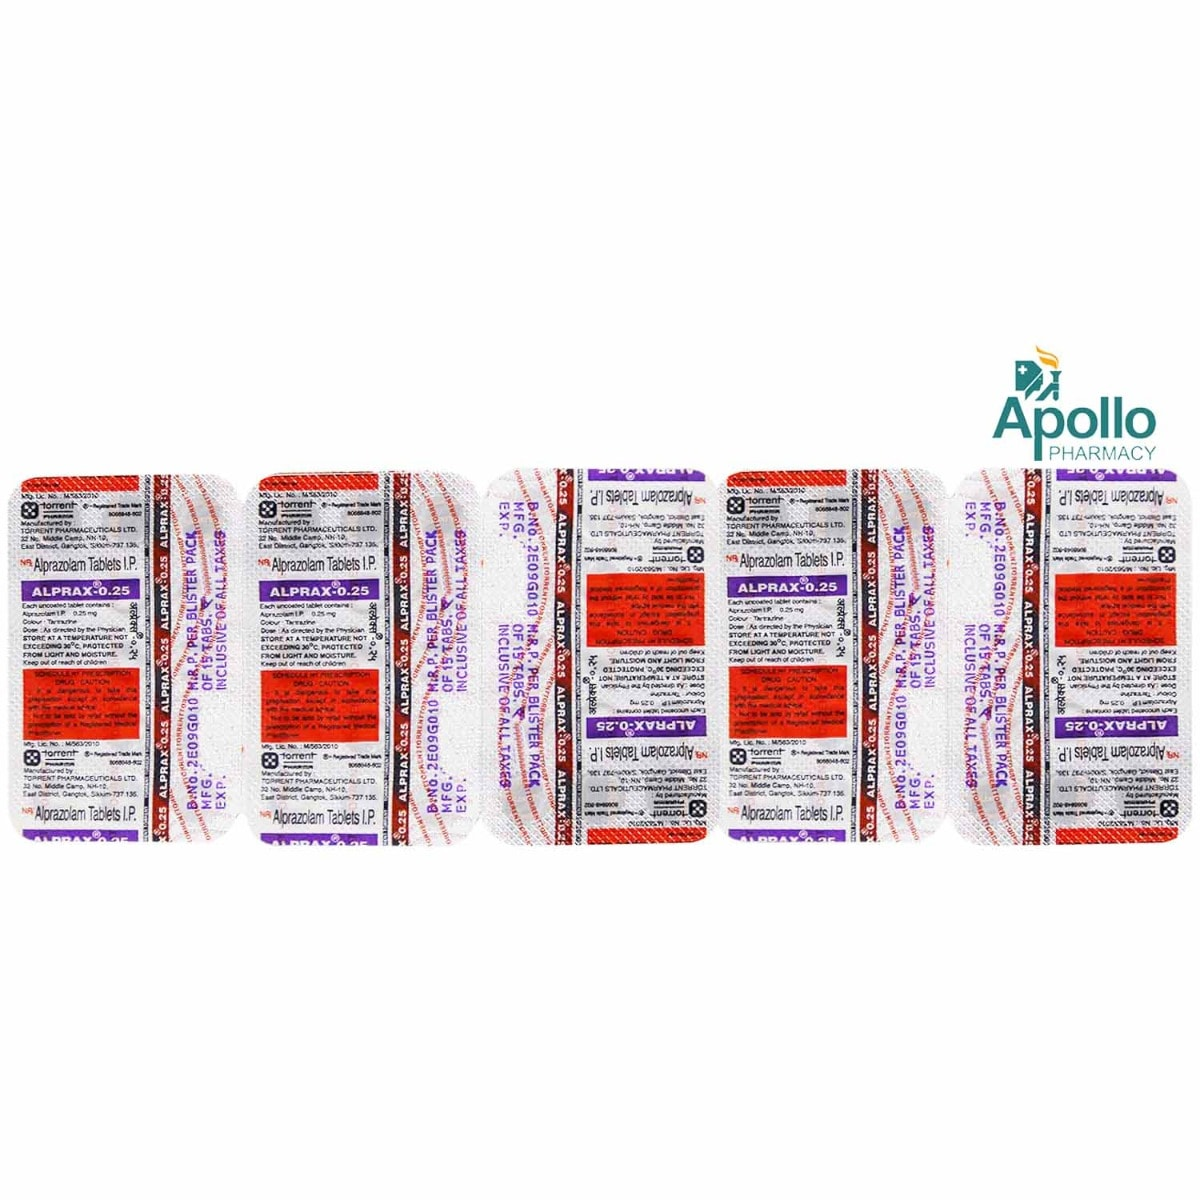 Alprax 0.25 Tablet 15's, Pack of 15 TABLETS